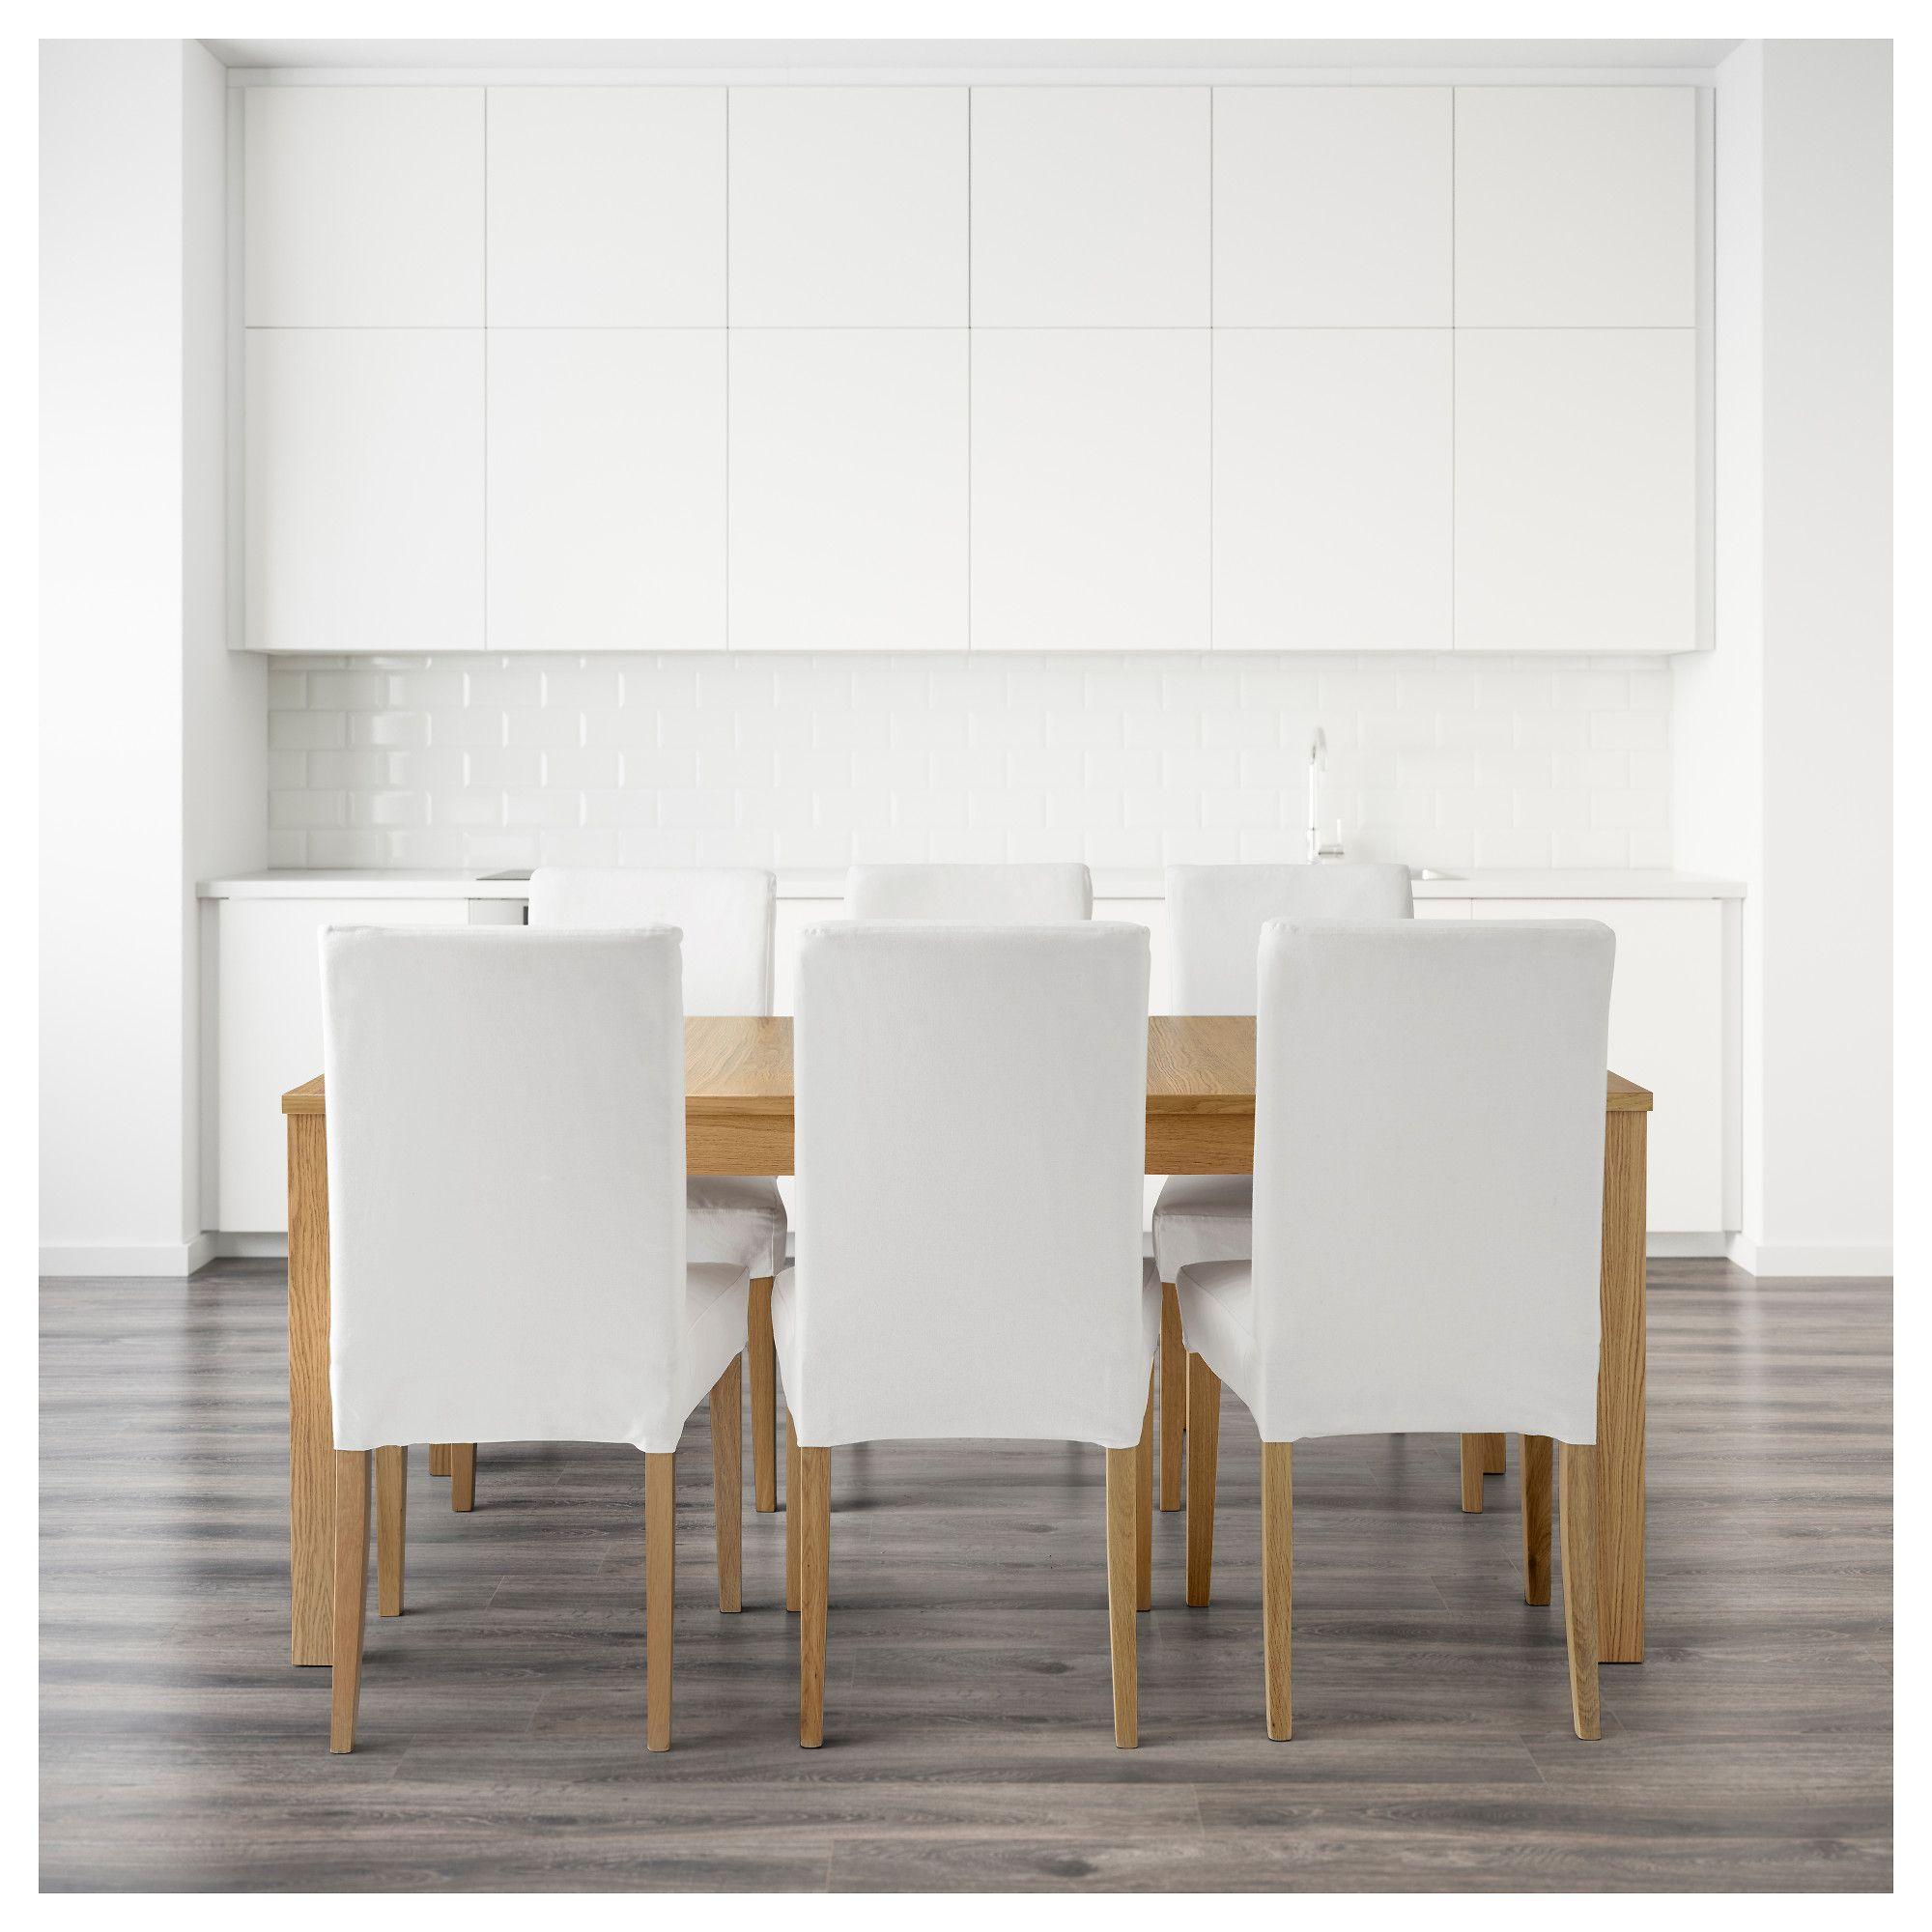 Ikea Bjursta Mesa Comedor | Henriksdal Bjursta Table And 6 Chairs Oak Veneer Grasbo White 175